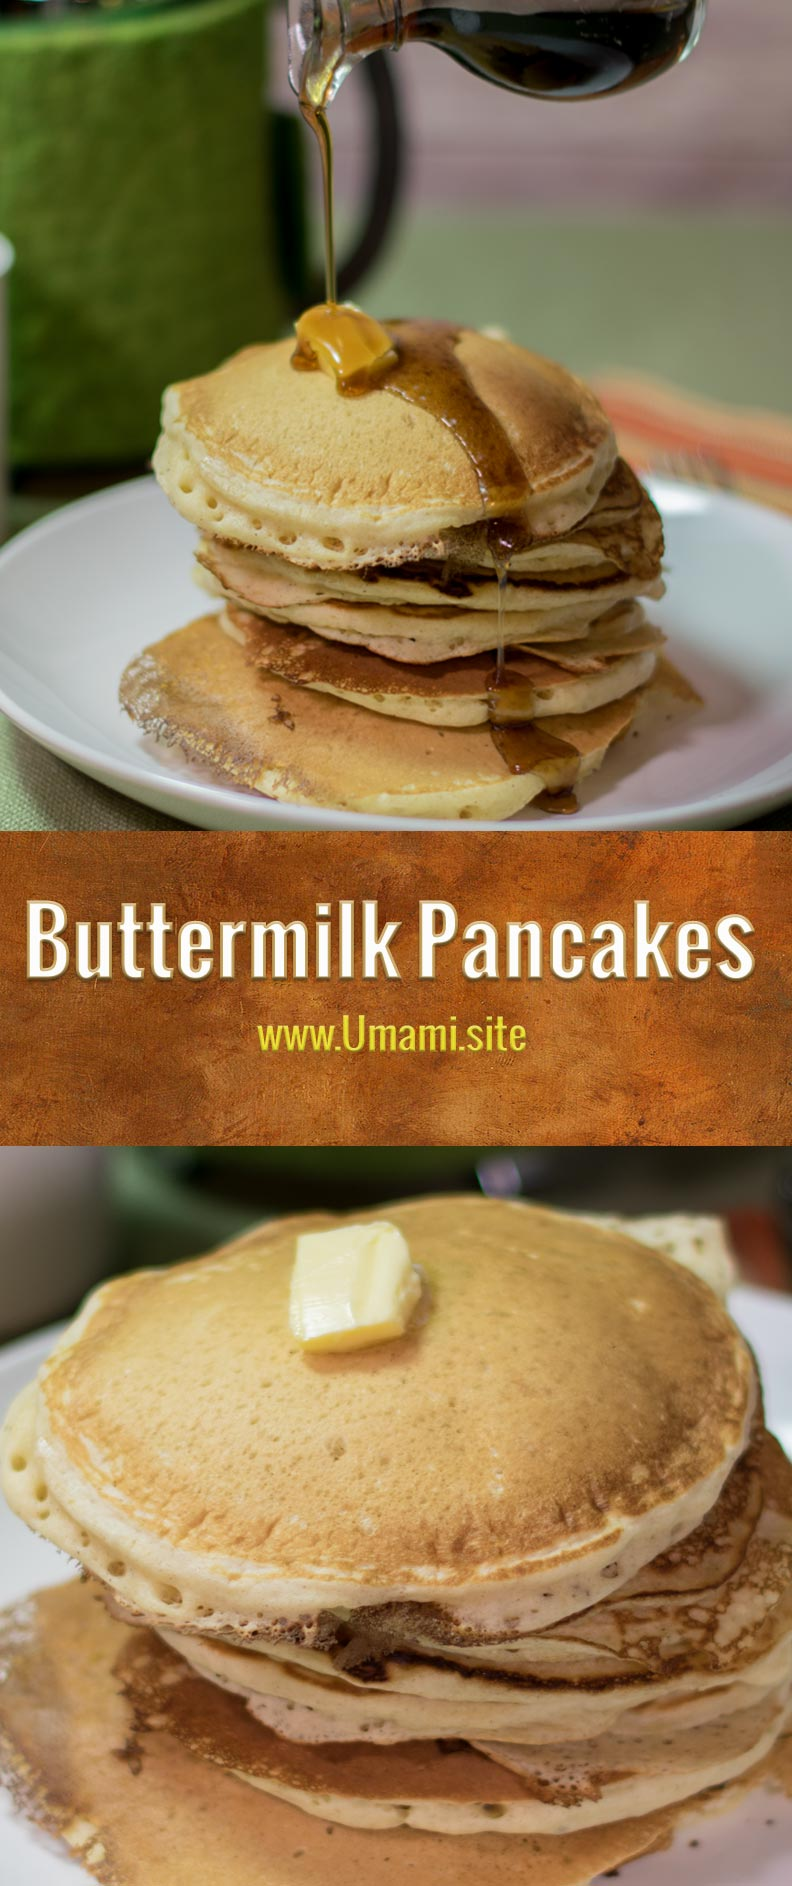 Buttermilk Pancakes Recipes